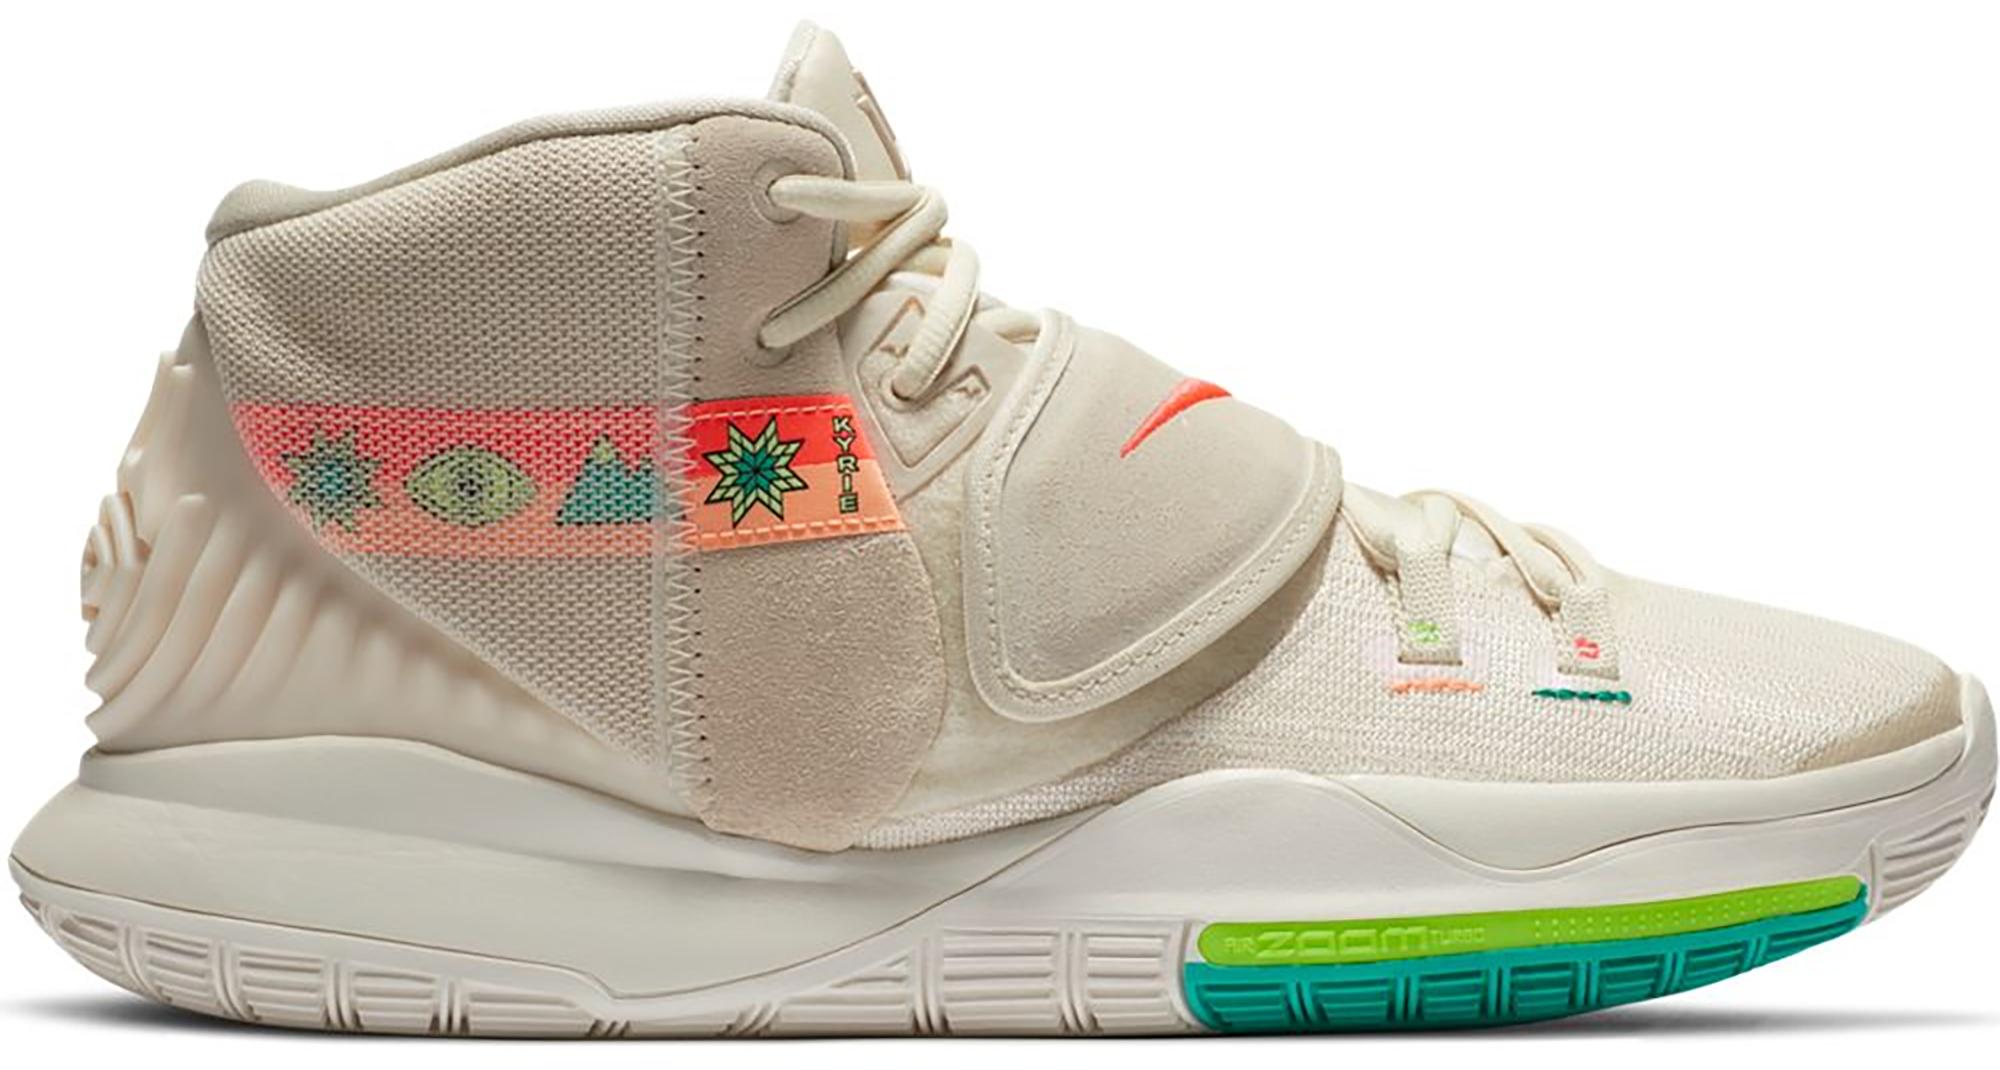 Nike Kyrie 6 N7 (2020) - CW1785-200